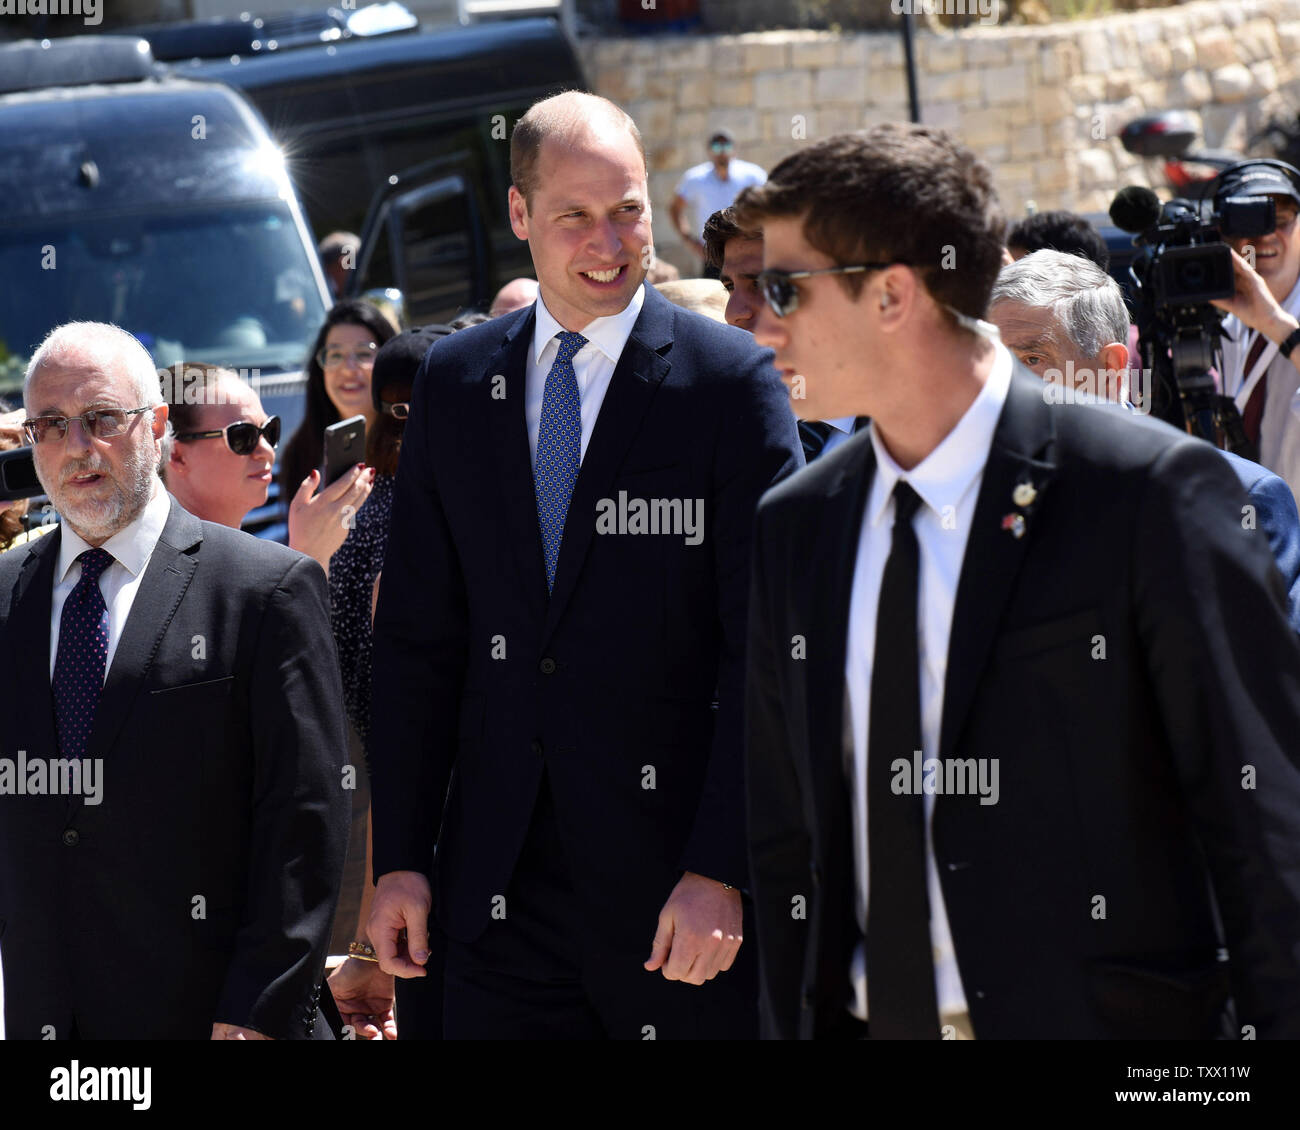 Prince William, the Duke of Cambridge, arrives to Yad Vashem, the World Holocaust Remembrance Center, in Jerusalem, Israel, June 26, 2018.  Photo by Debbie Hill/UPI - Stock Image